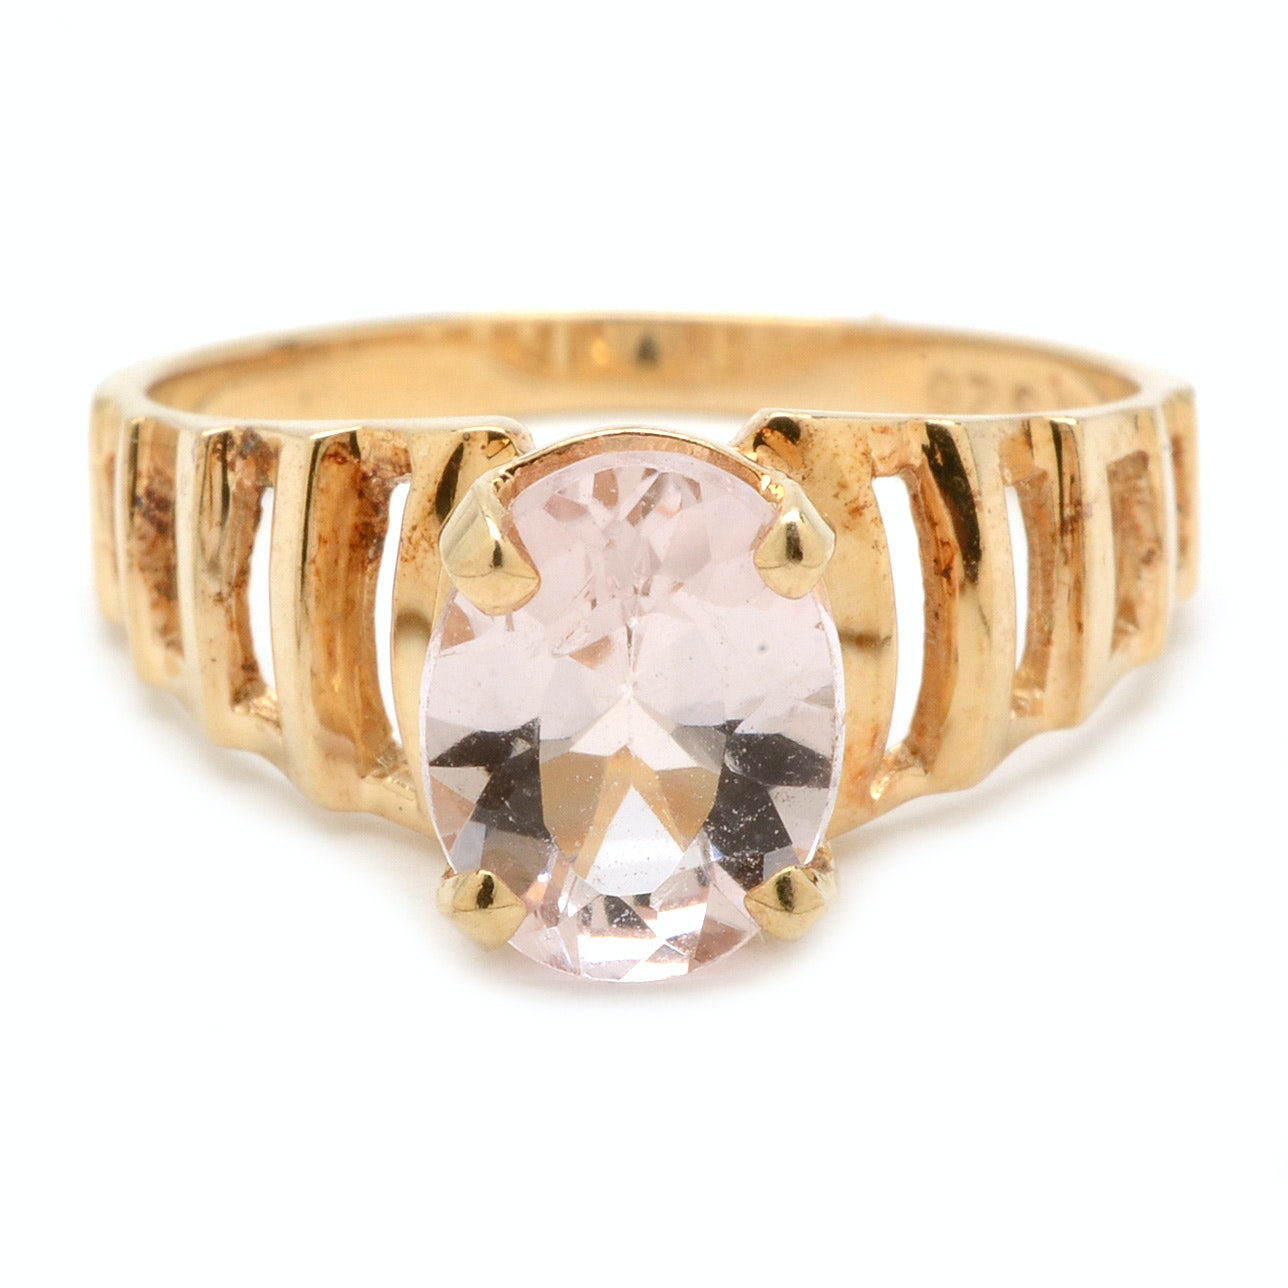 10K Yellow Gold Morganite Ring